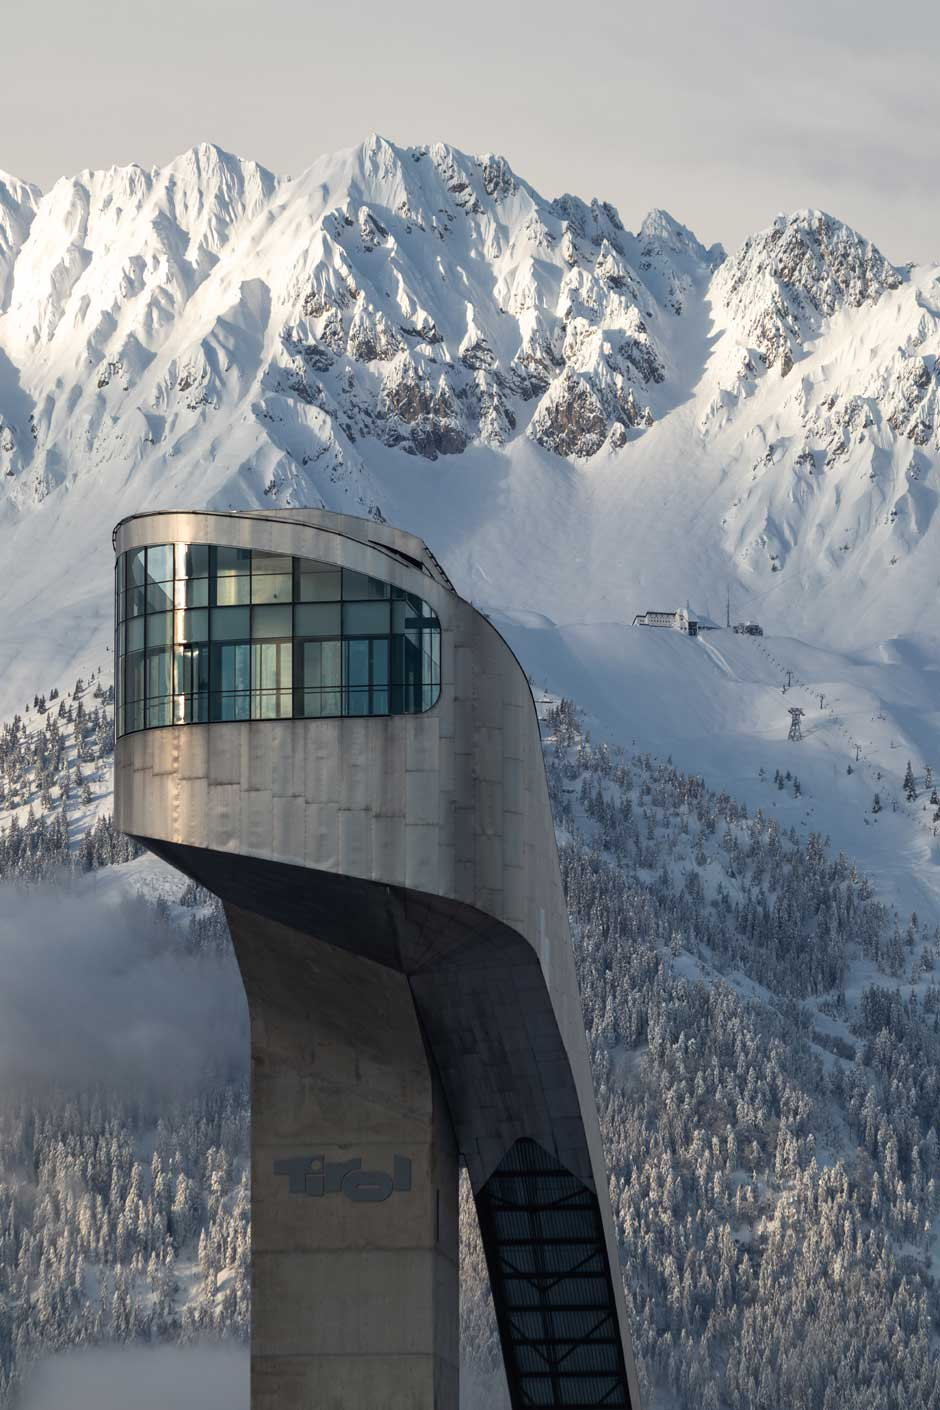 Trampolín de Salto Bergisel. © Innsbruck Tourismus / Tom Bause